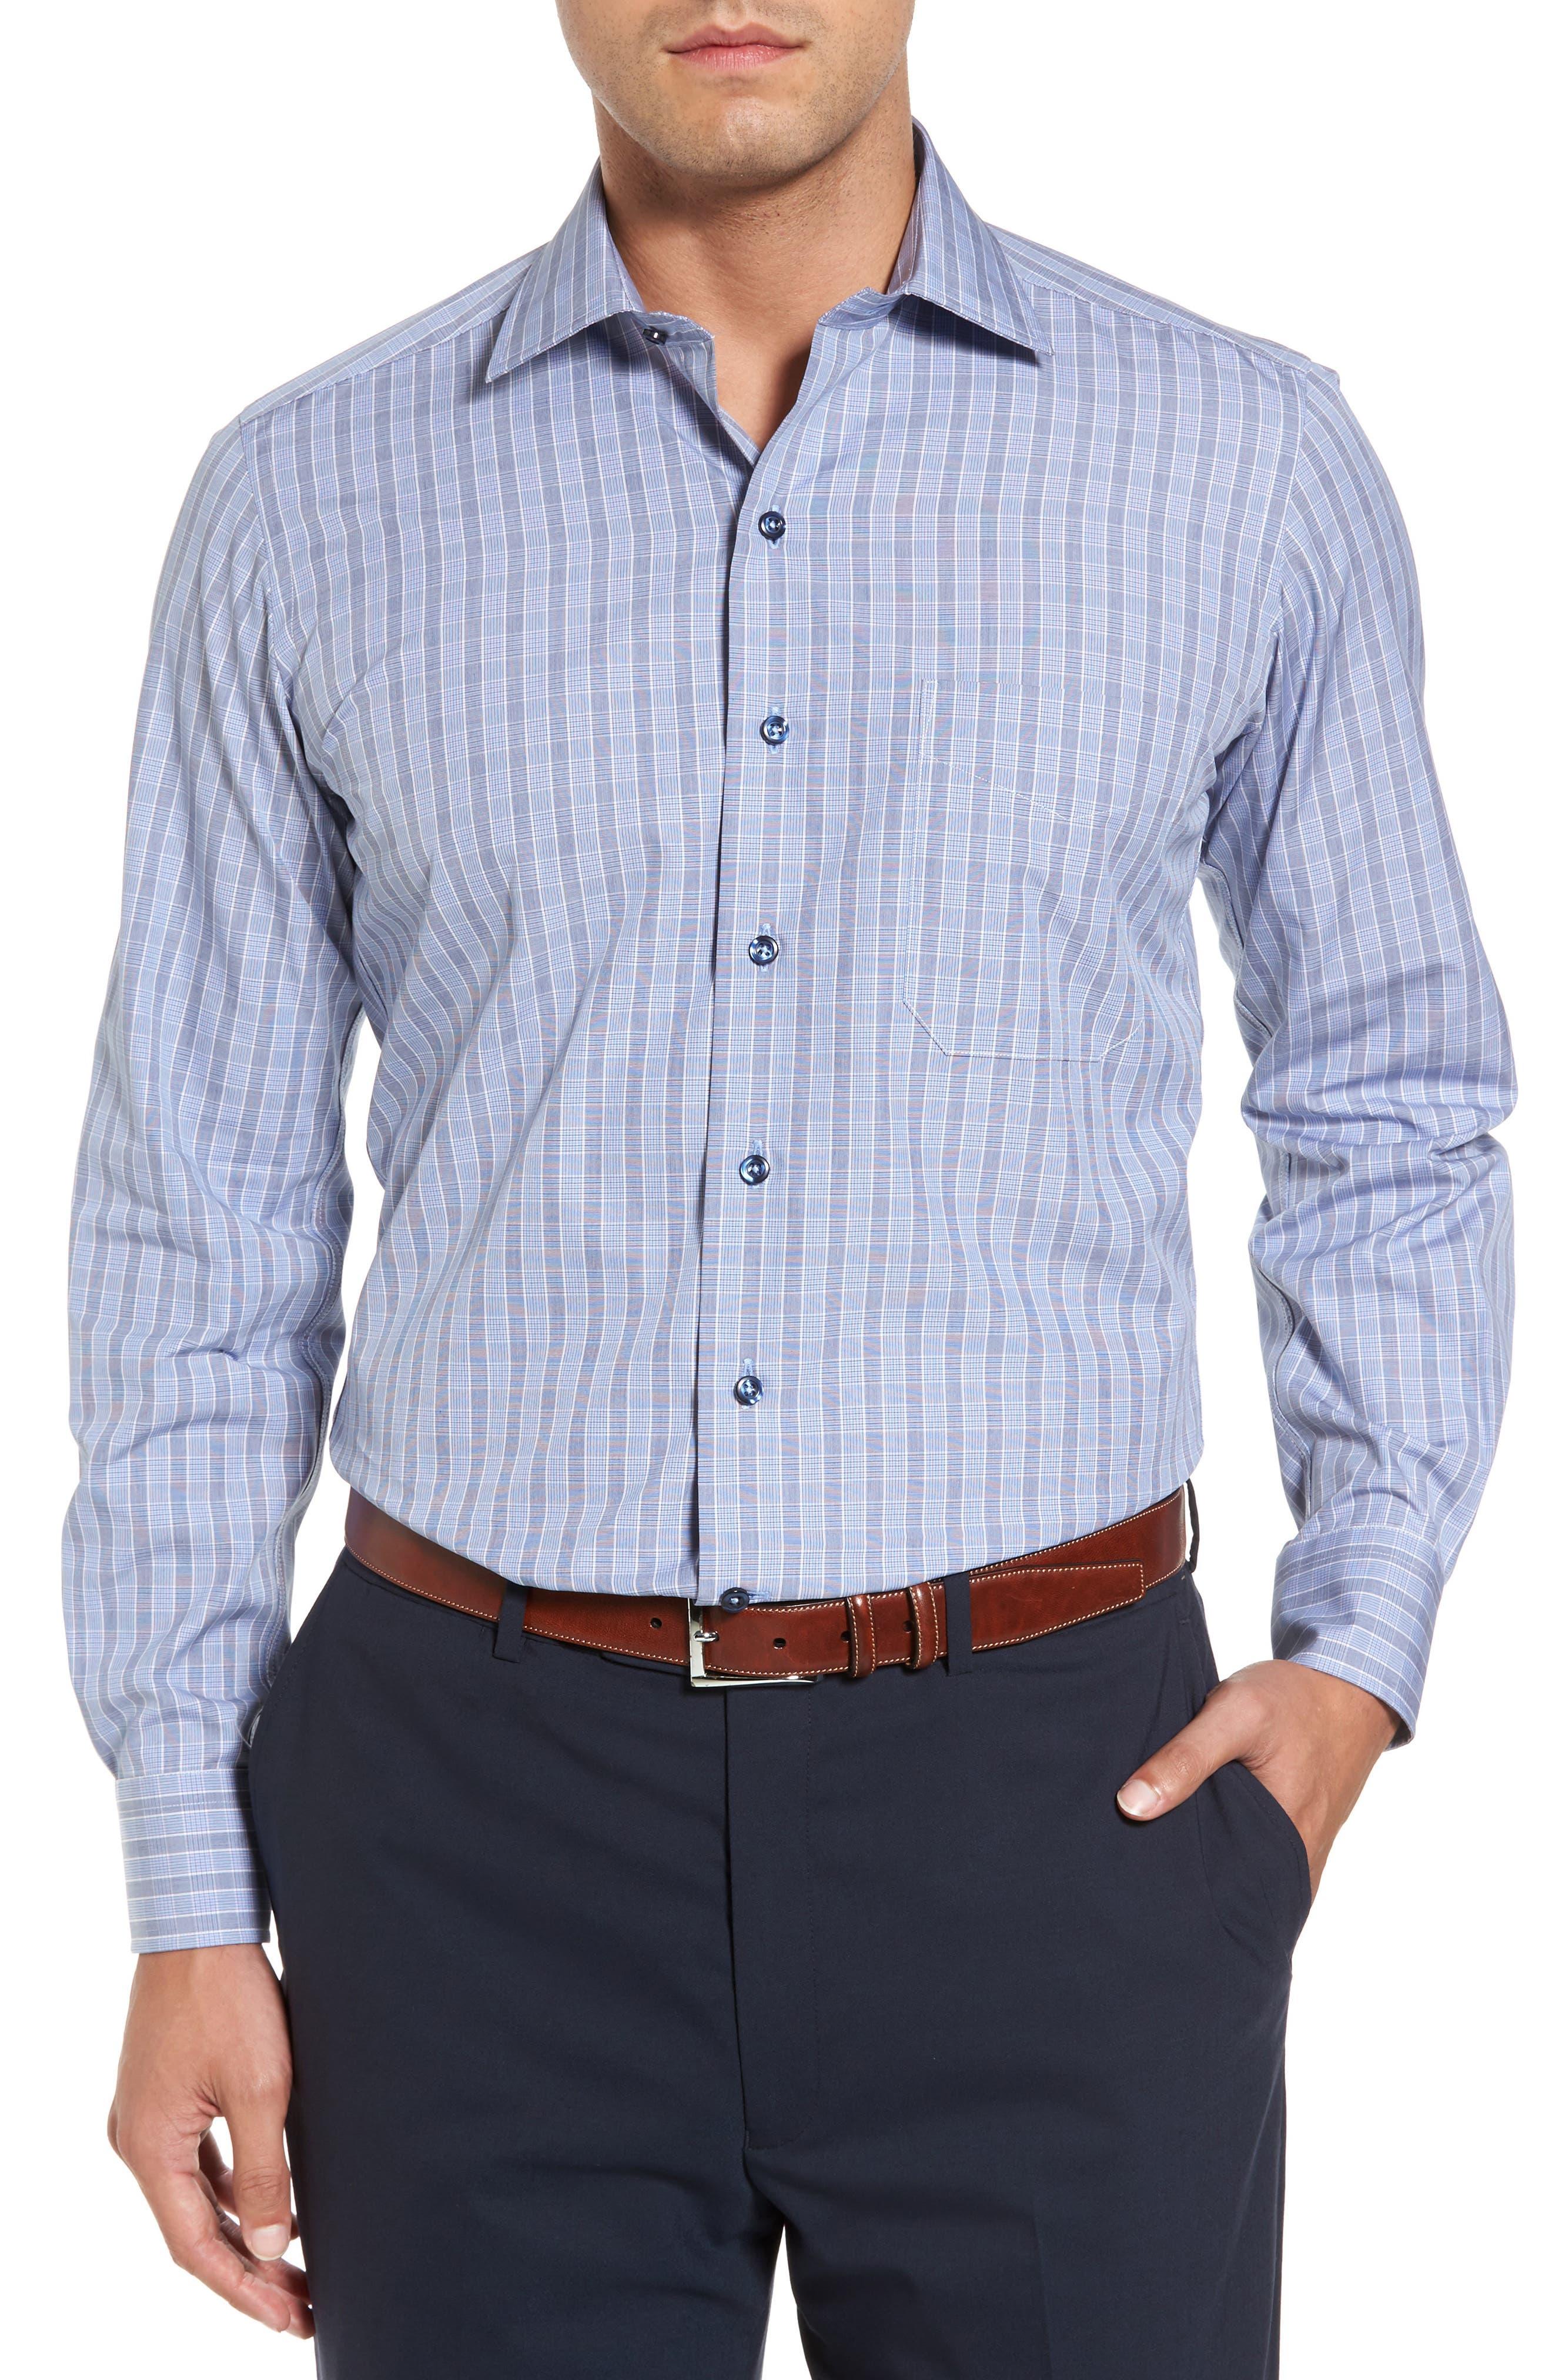 Regular Fit Plaid Sport Shirt,                             Main thumbnail 1, color,                             Navy/ Sky